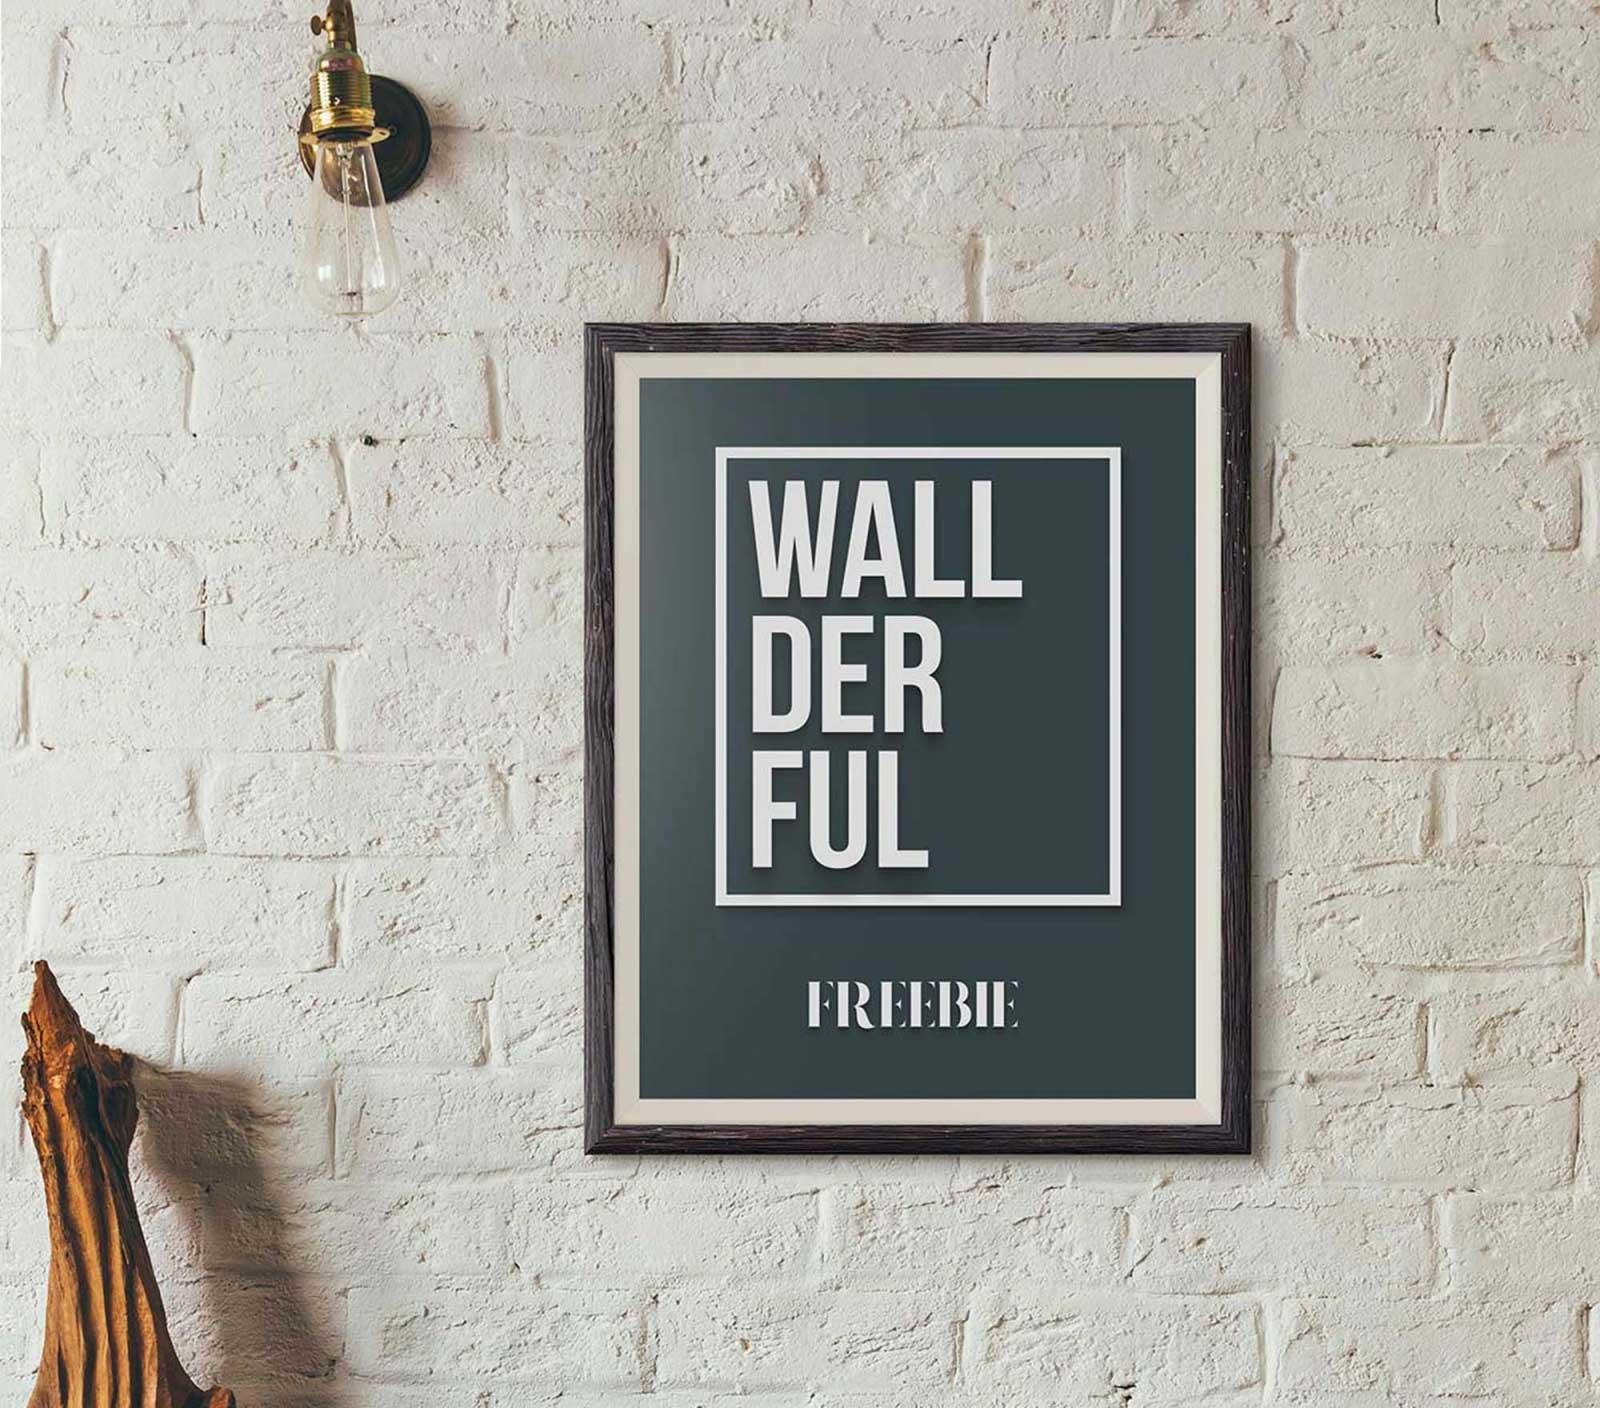 Free Wallderful Frame Mockups